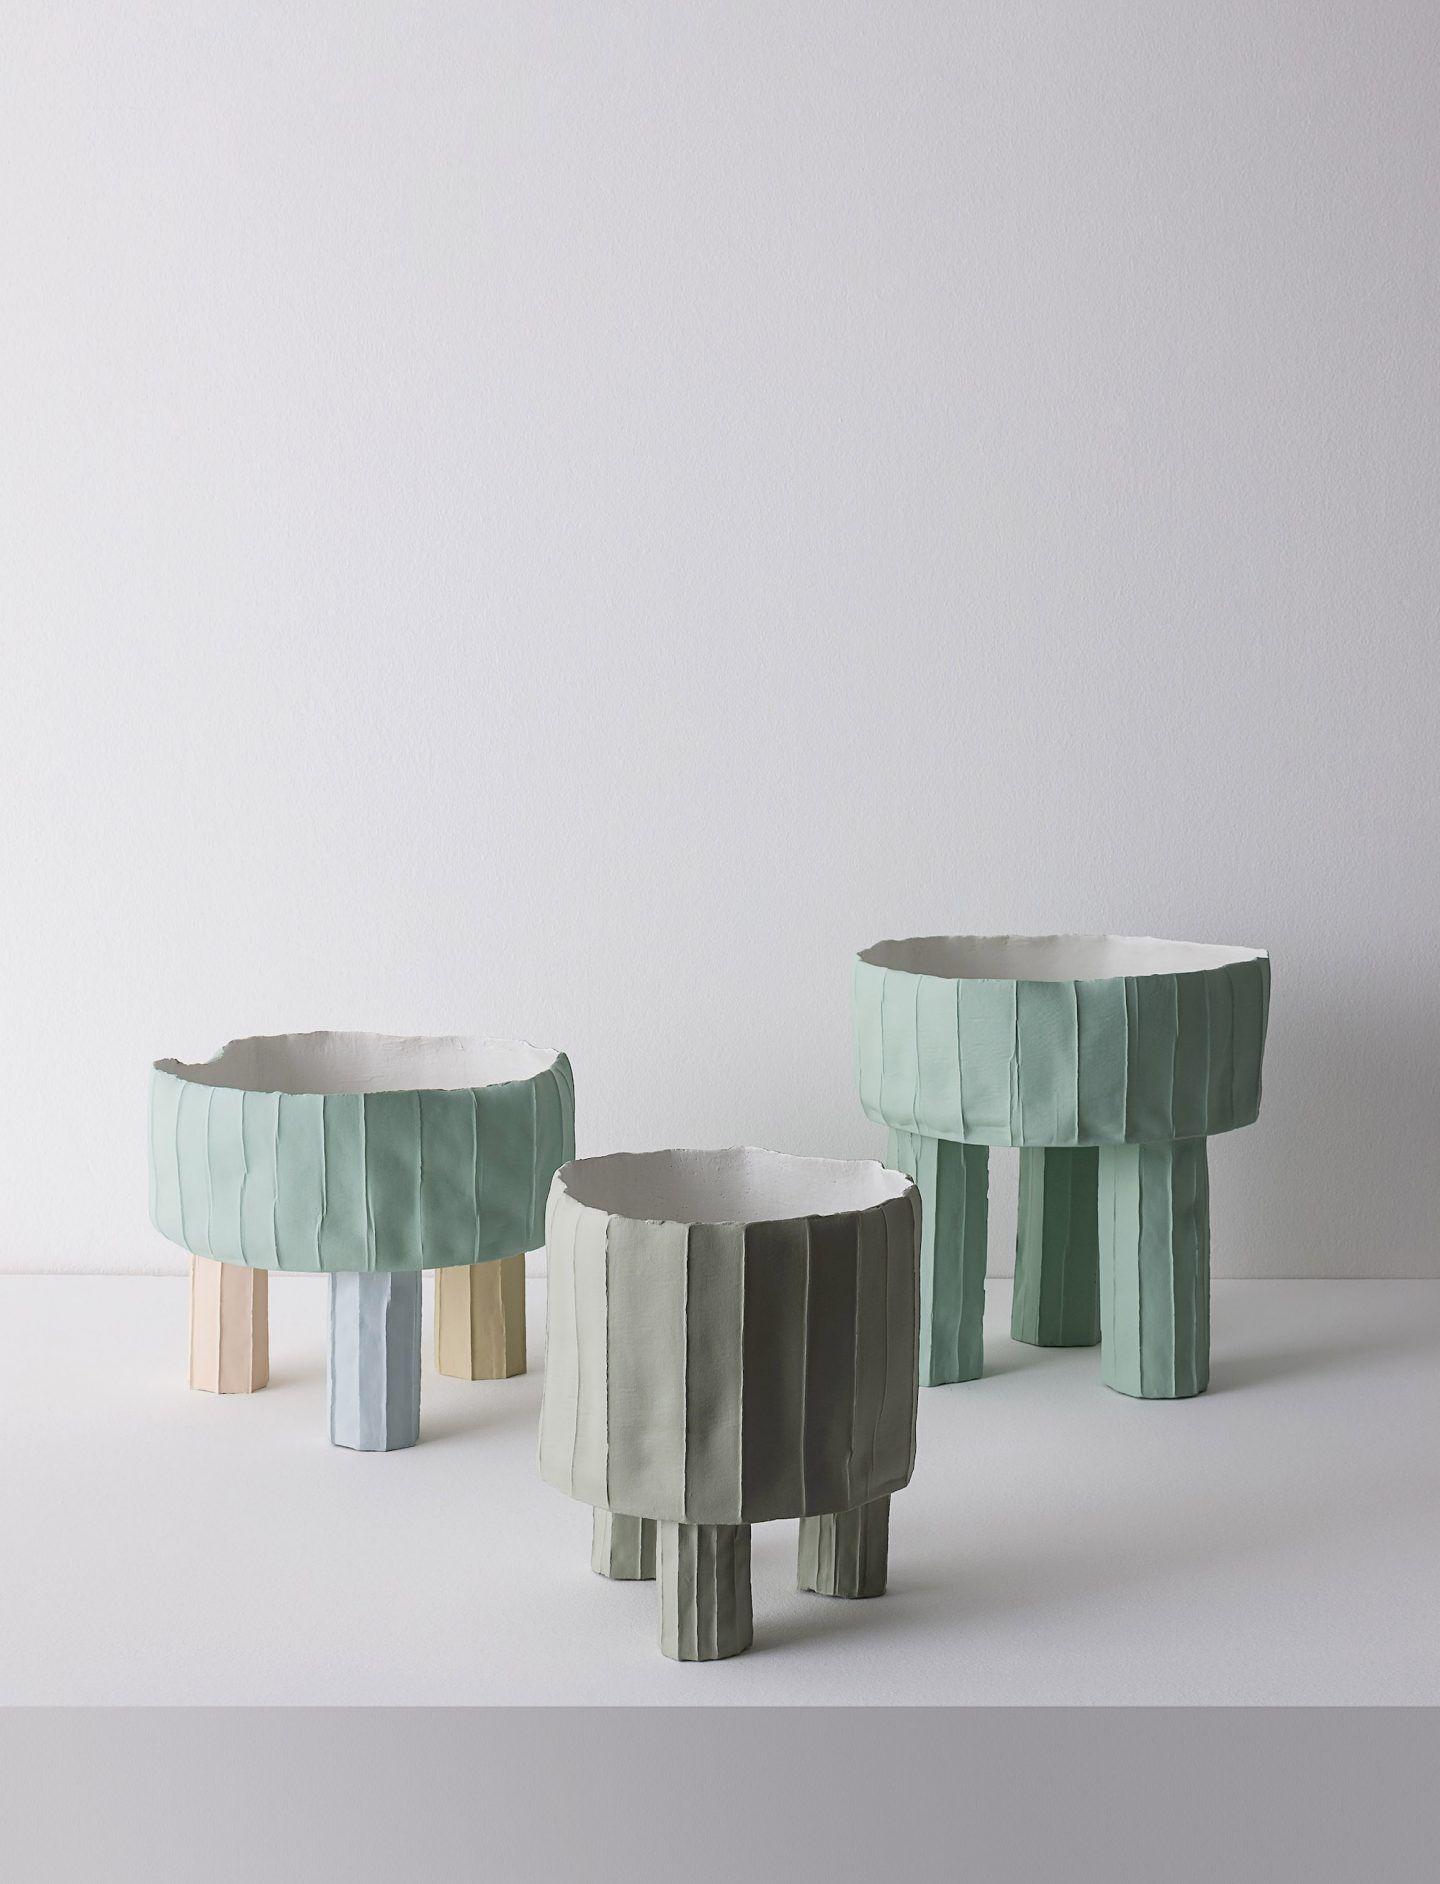 IGNANT-Design-Paola-Paronetto-012